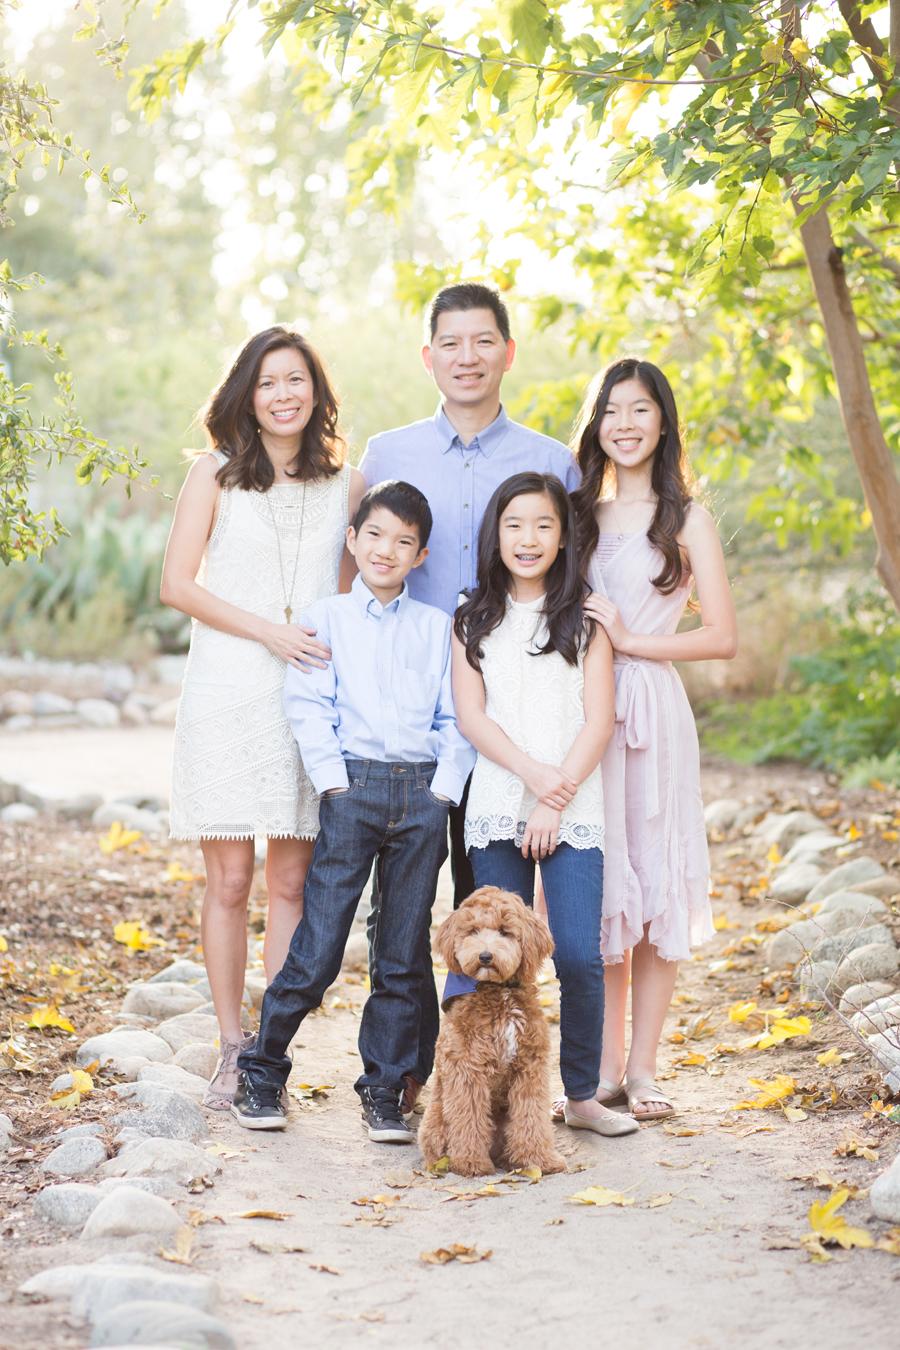 pasadenafamilyphotography_kos001